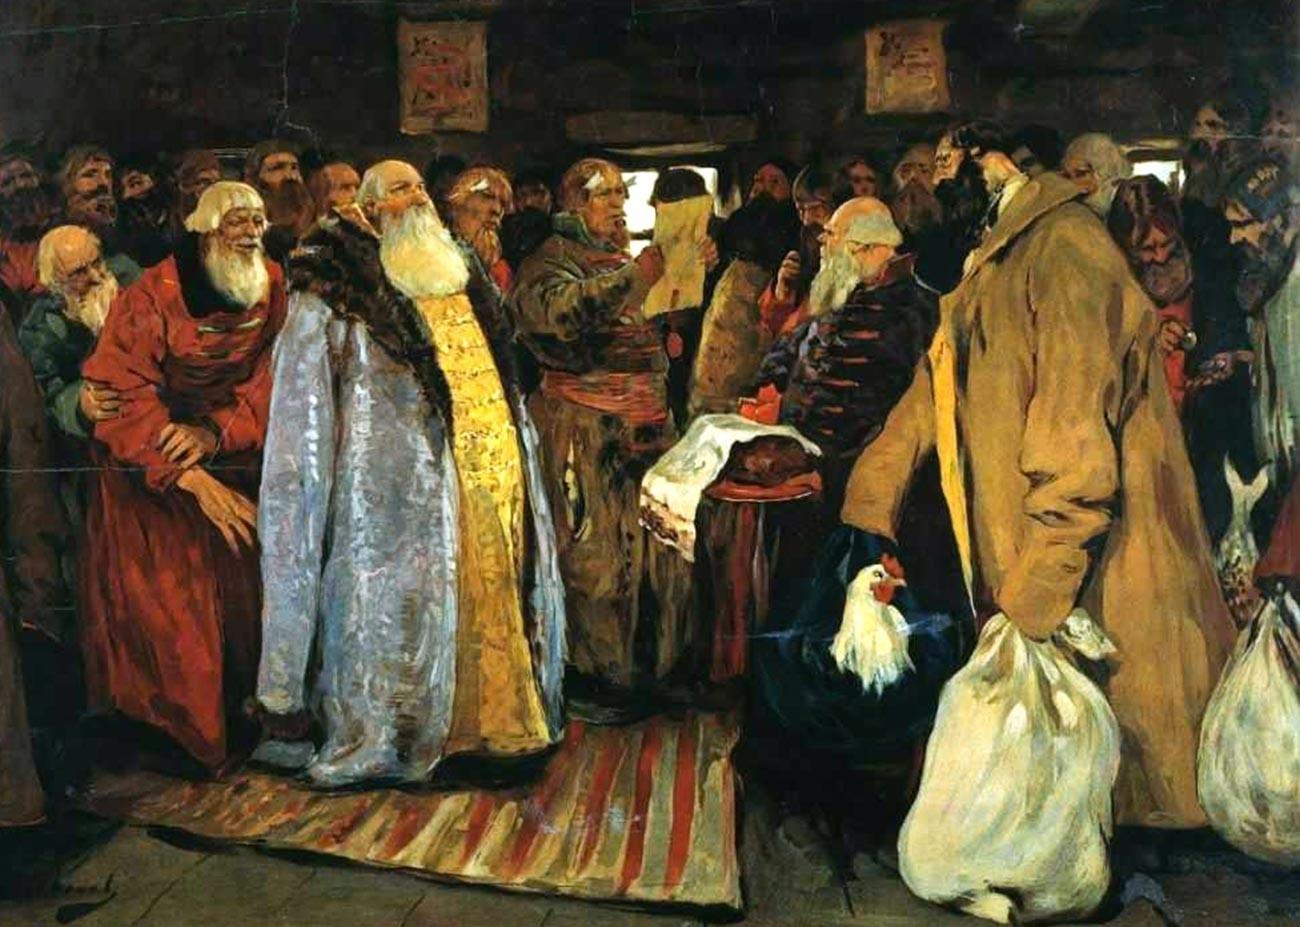 'Kedatangan seorang voevoda' oleh Sergei Ivanov.